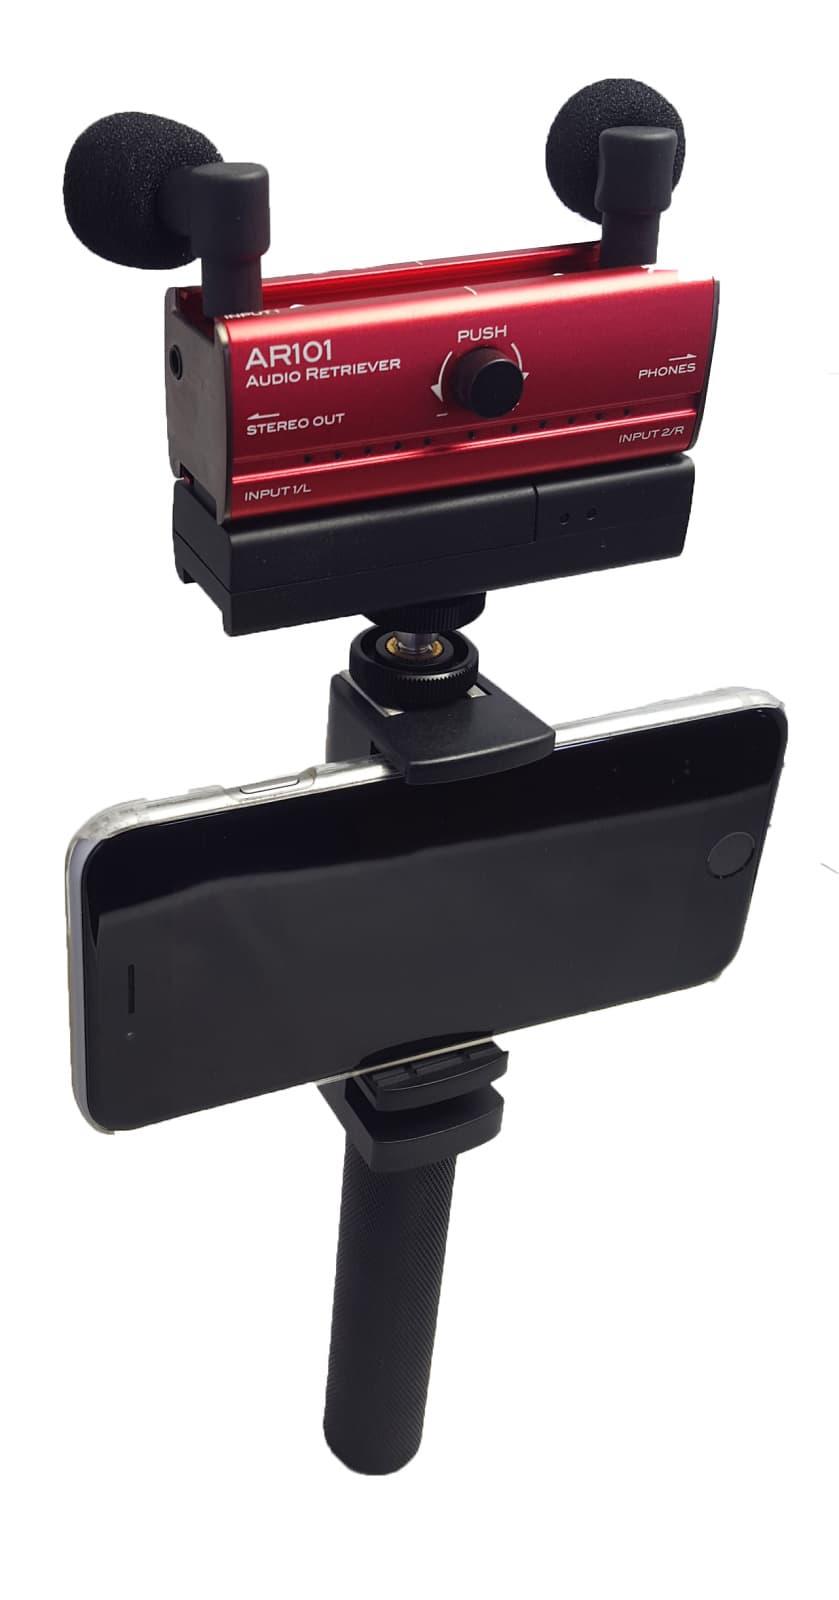 Fostex AR101L RED Audio Interface with Lightening ...